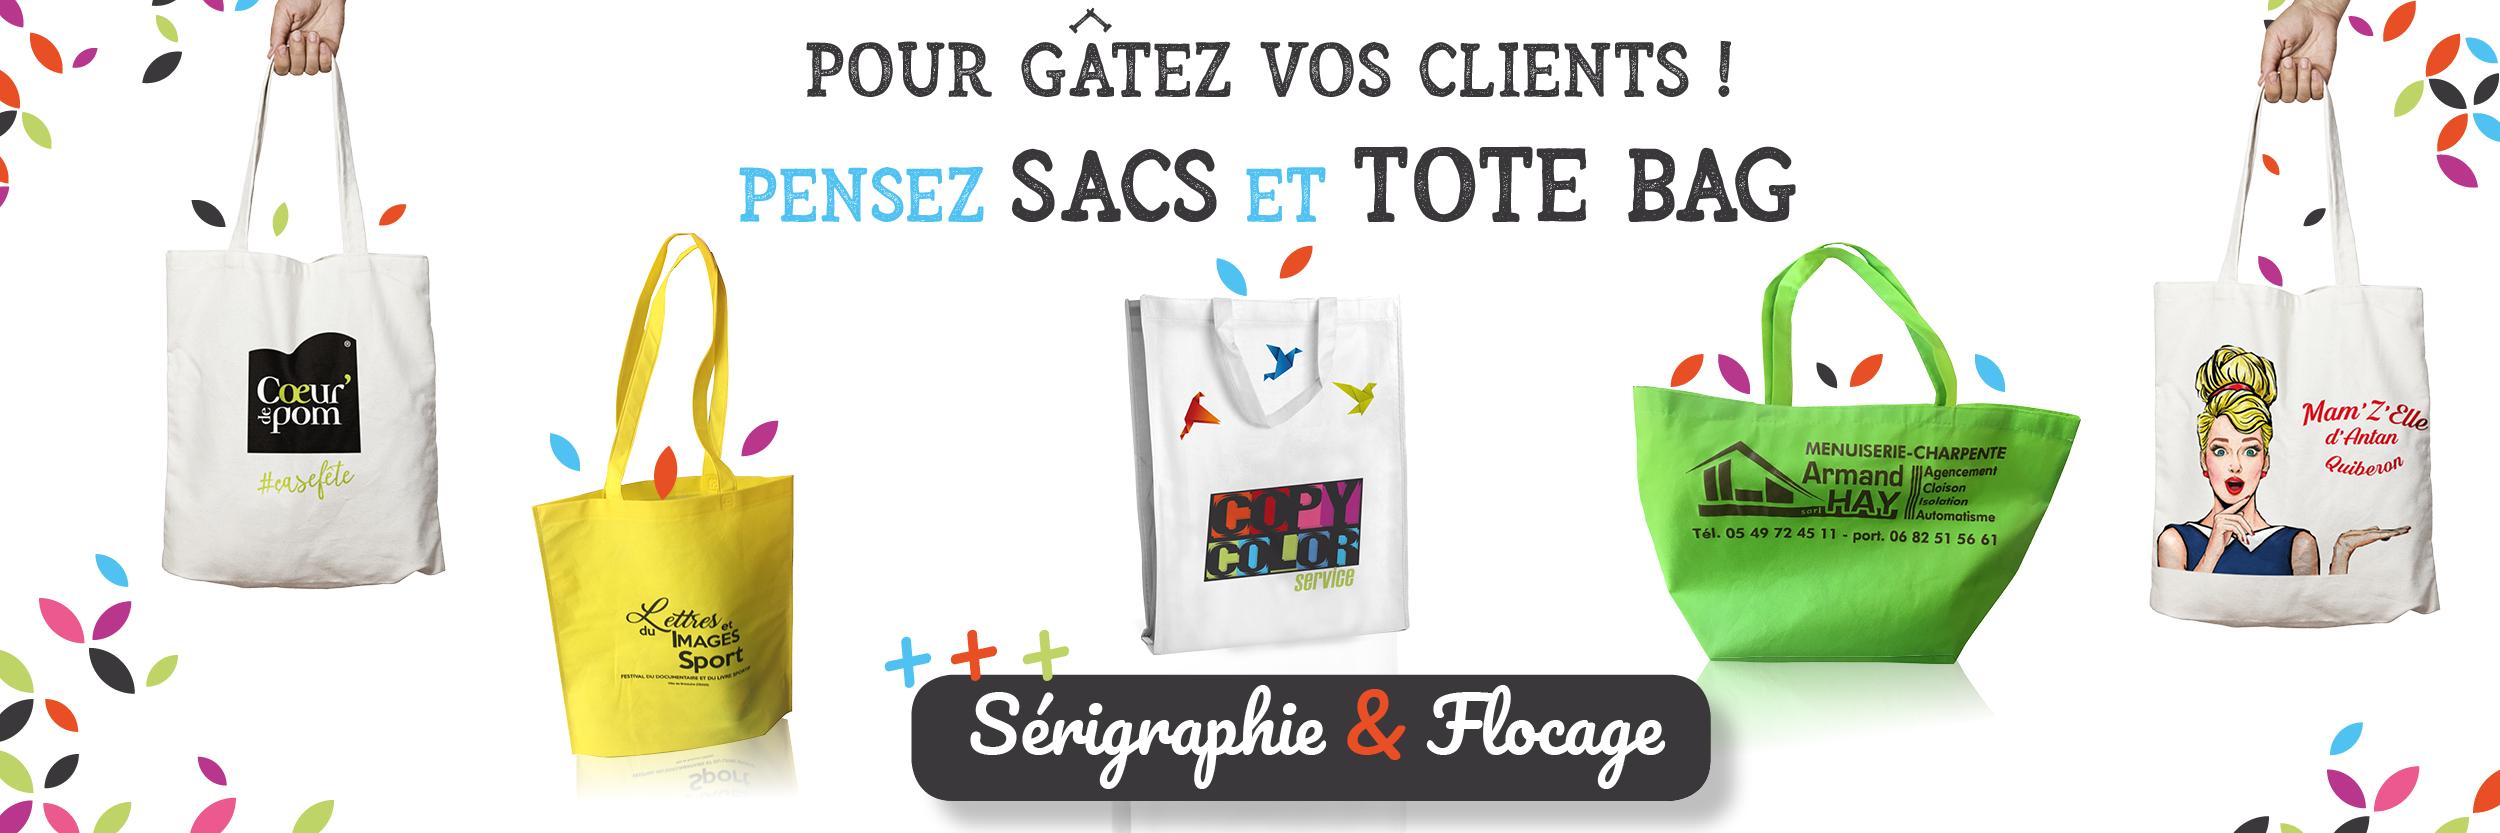 Bannières WEB_Totebag_Teeshirt_Tiragephotos-Copycolorbressuire